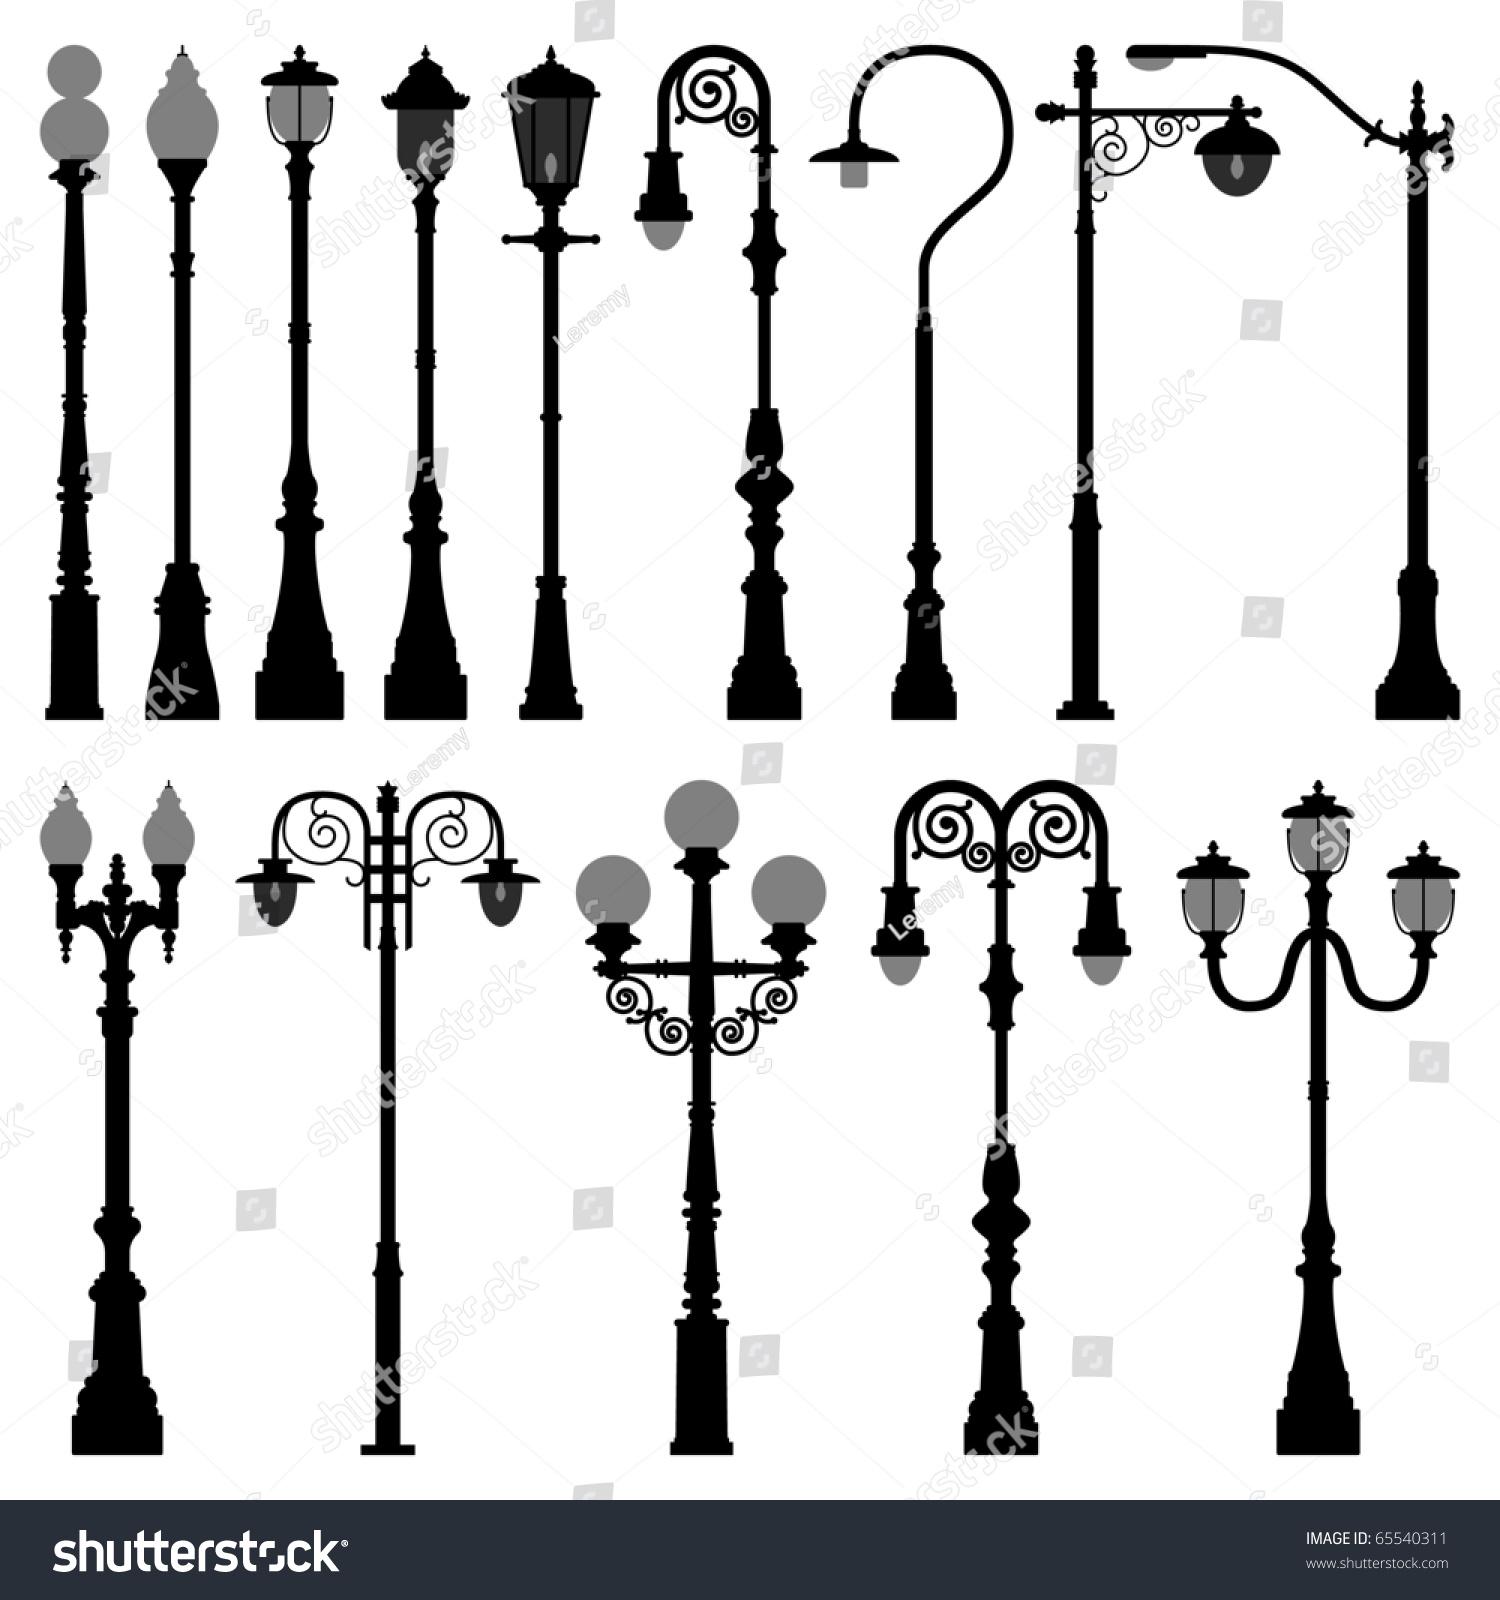 Light Pole Terminology: Lamp Post Lamppost Street Road Light Pole Stock Vector